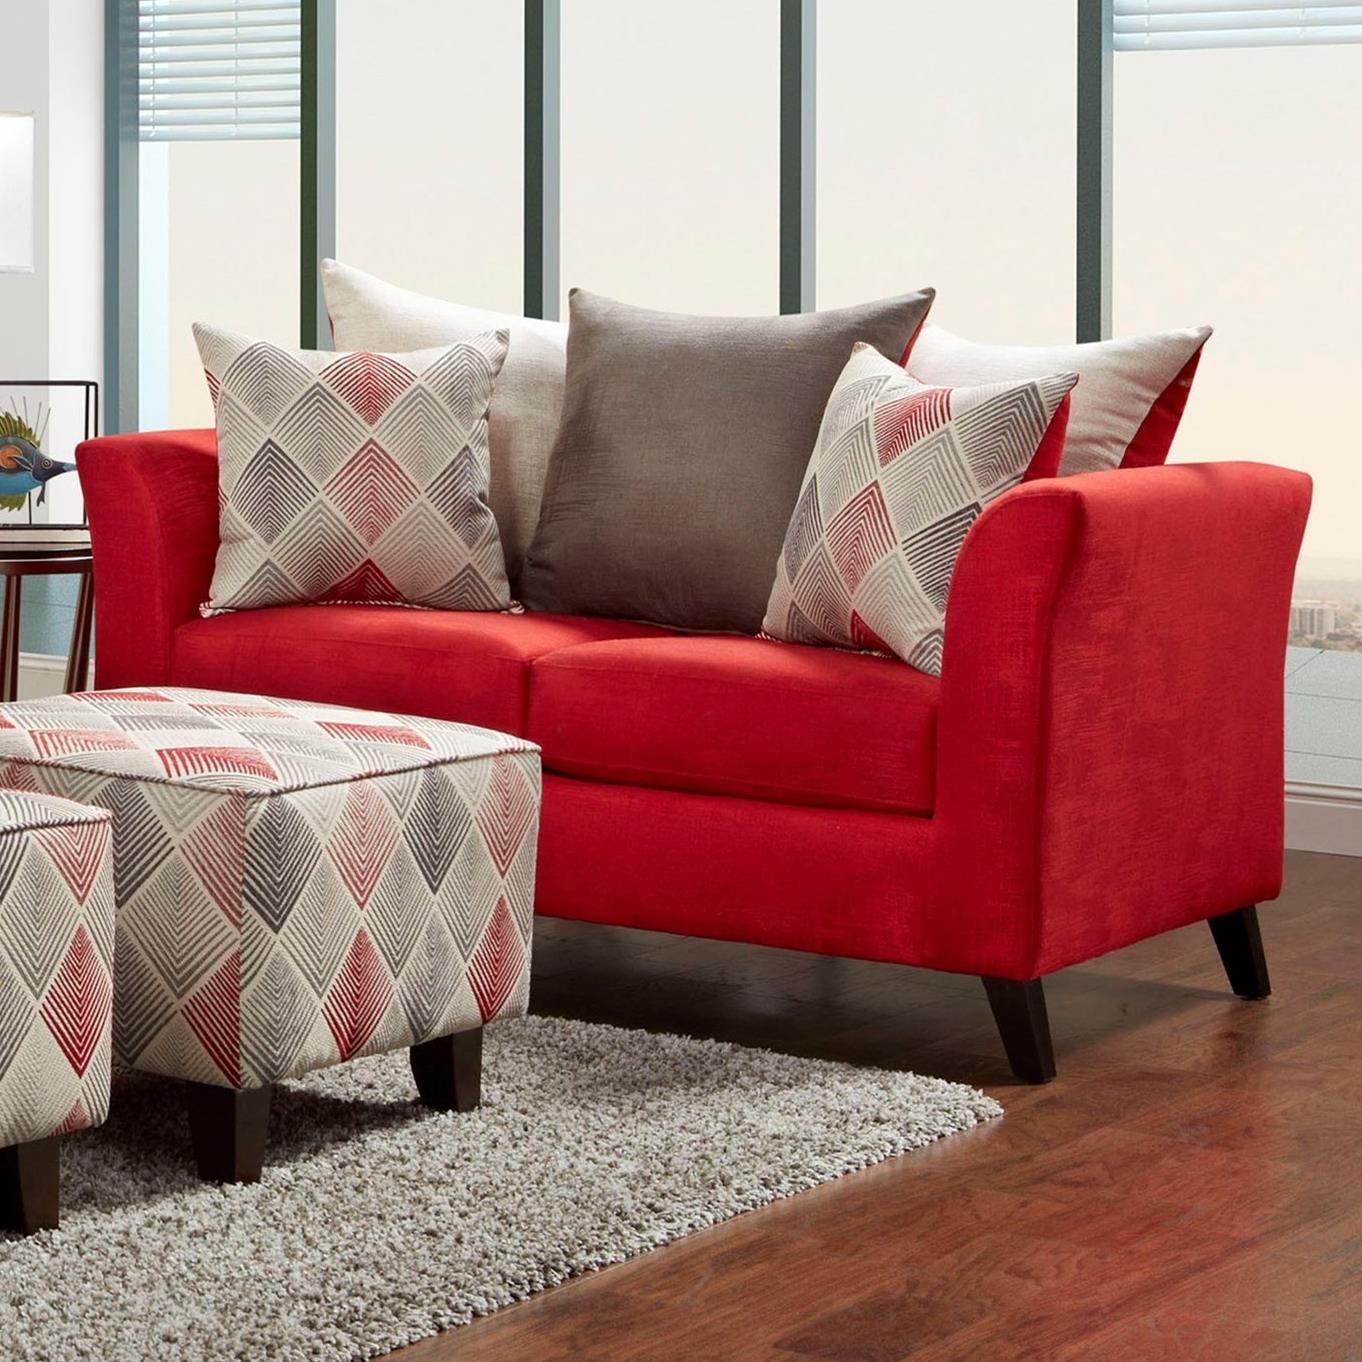 1960 Love Seat by Washington Furniture at Lynn's Furniture & Mattress